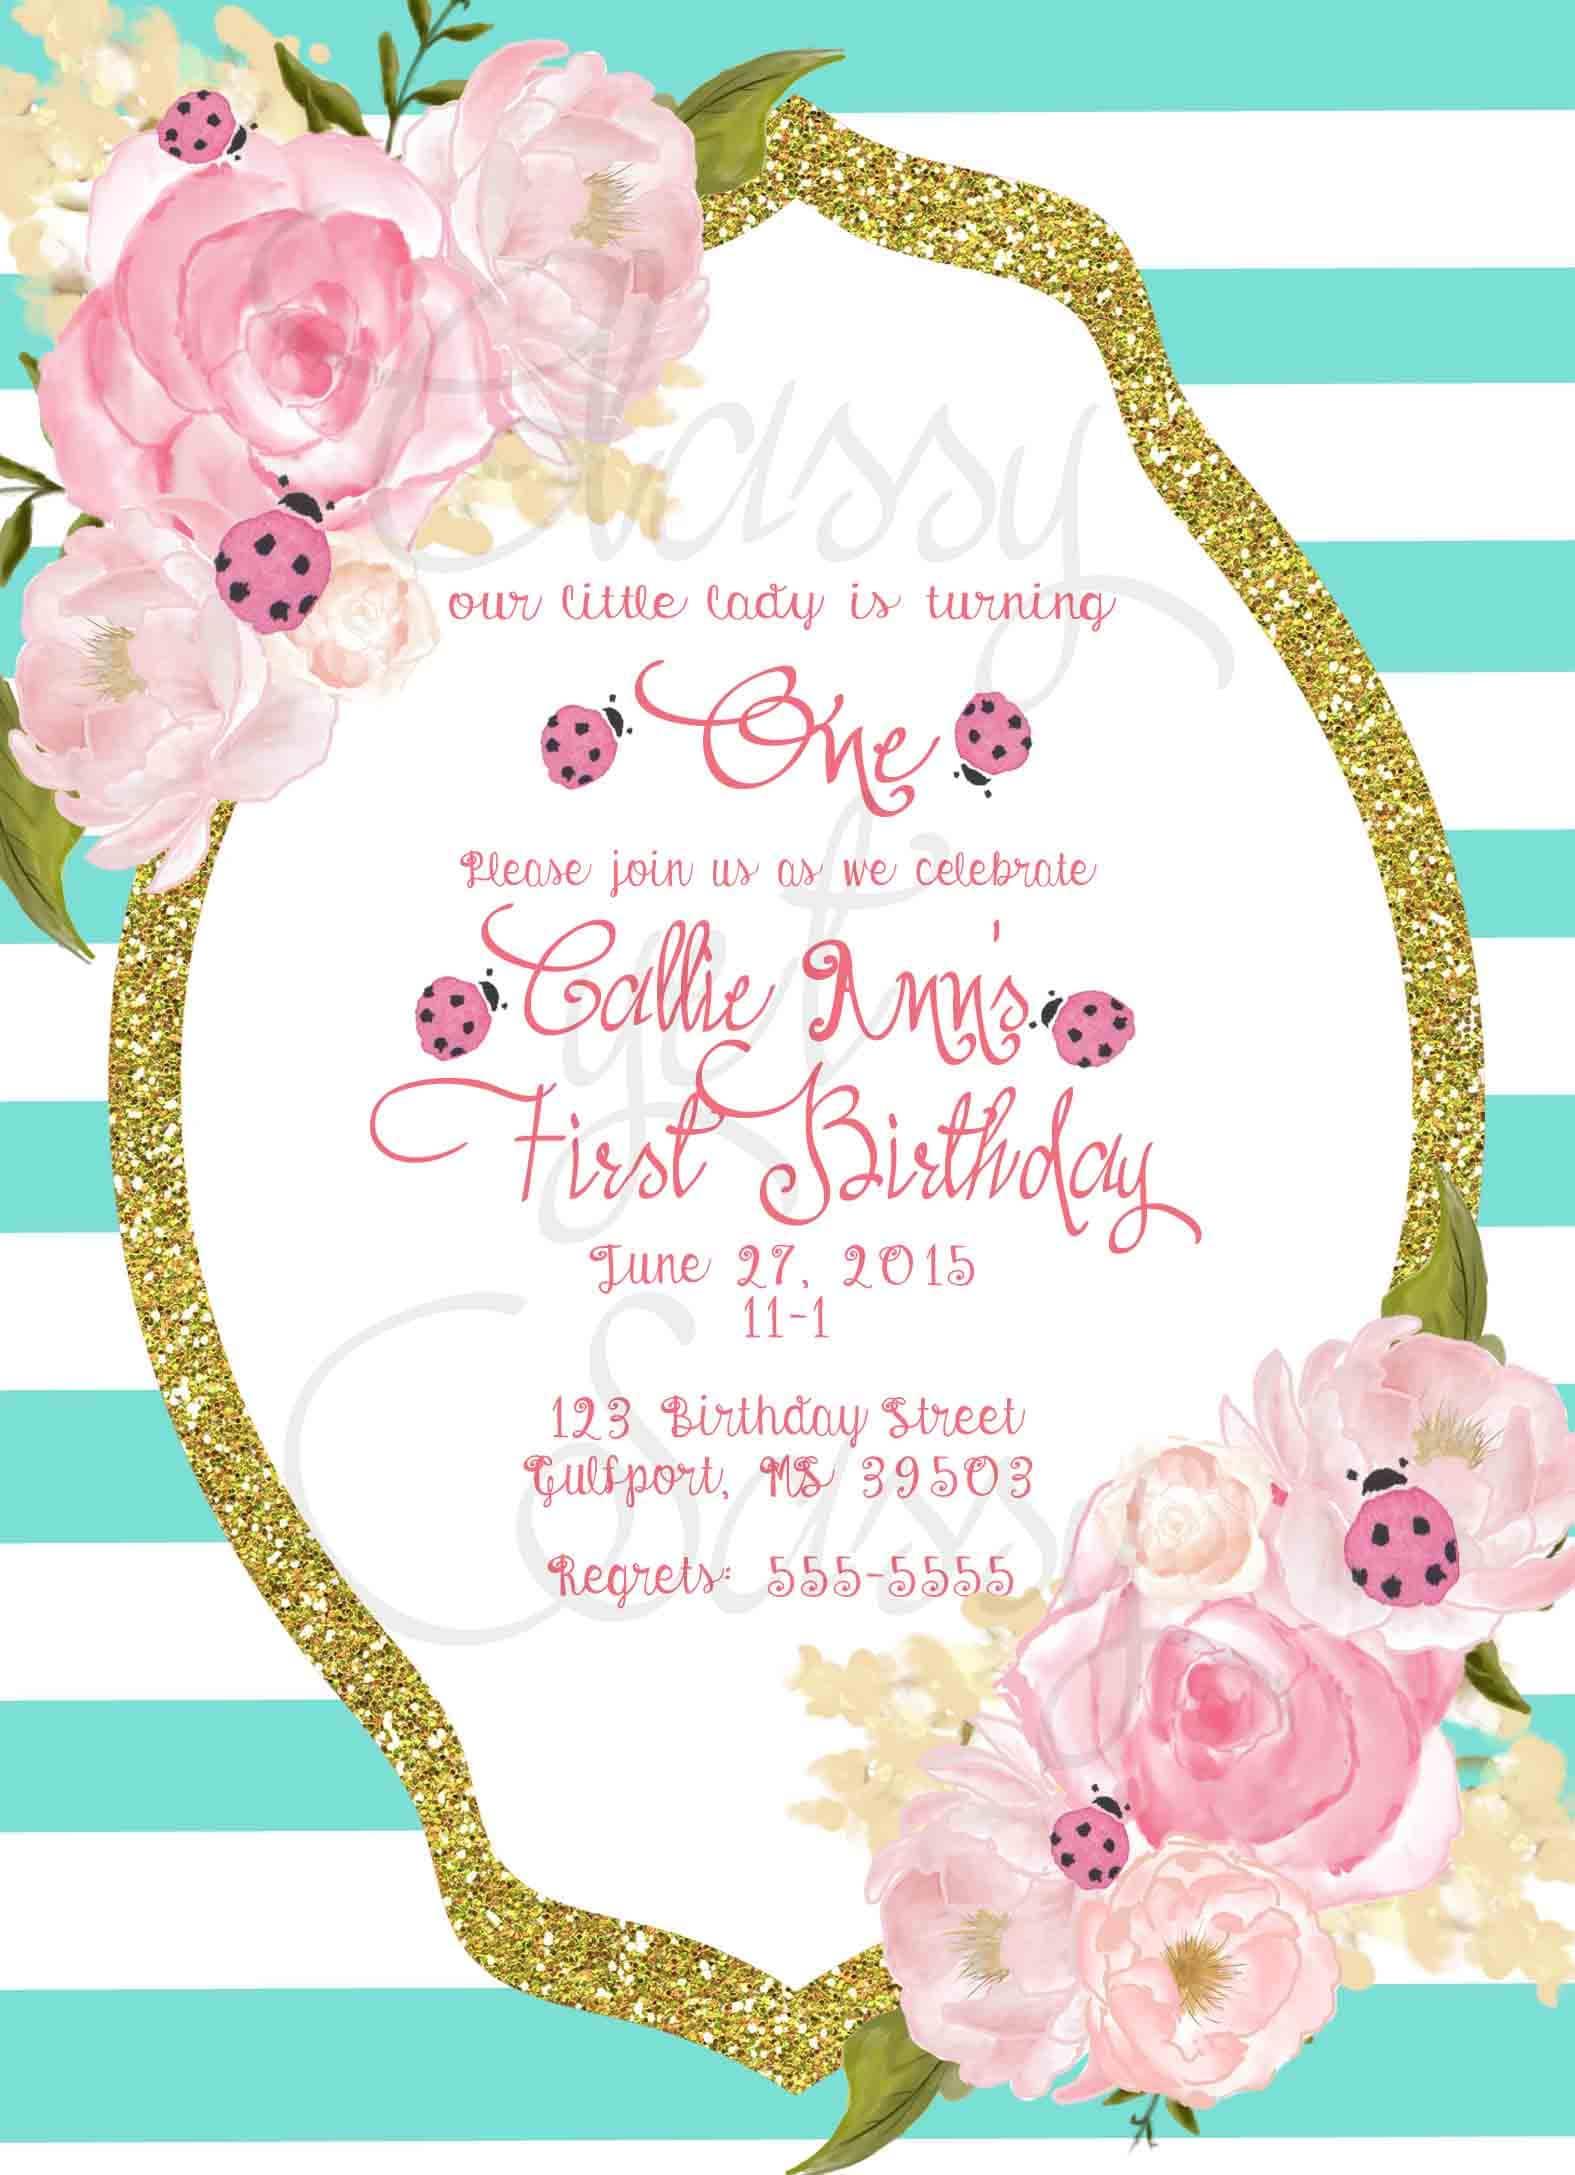 Ladybug Birthday Party Invitation, Ladybug Party, Aqua Glitter Party ...